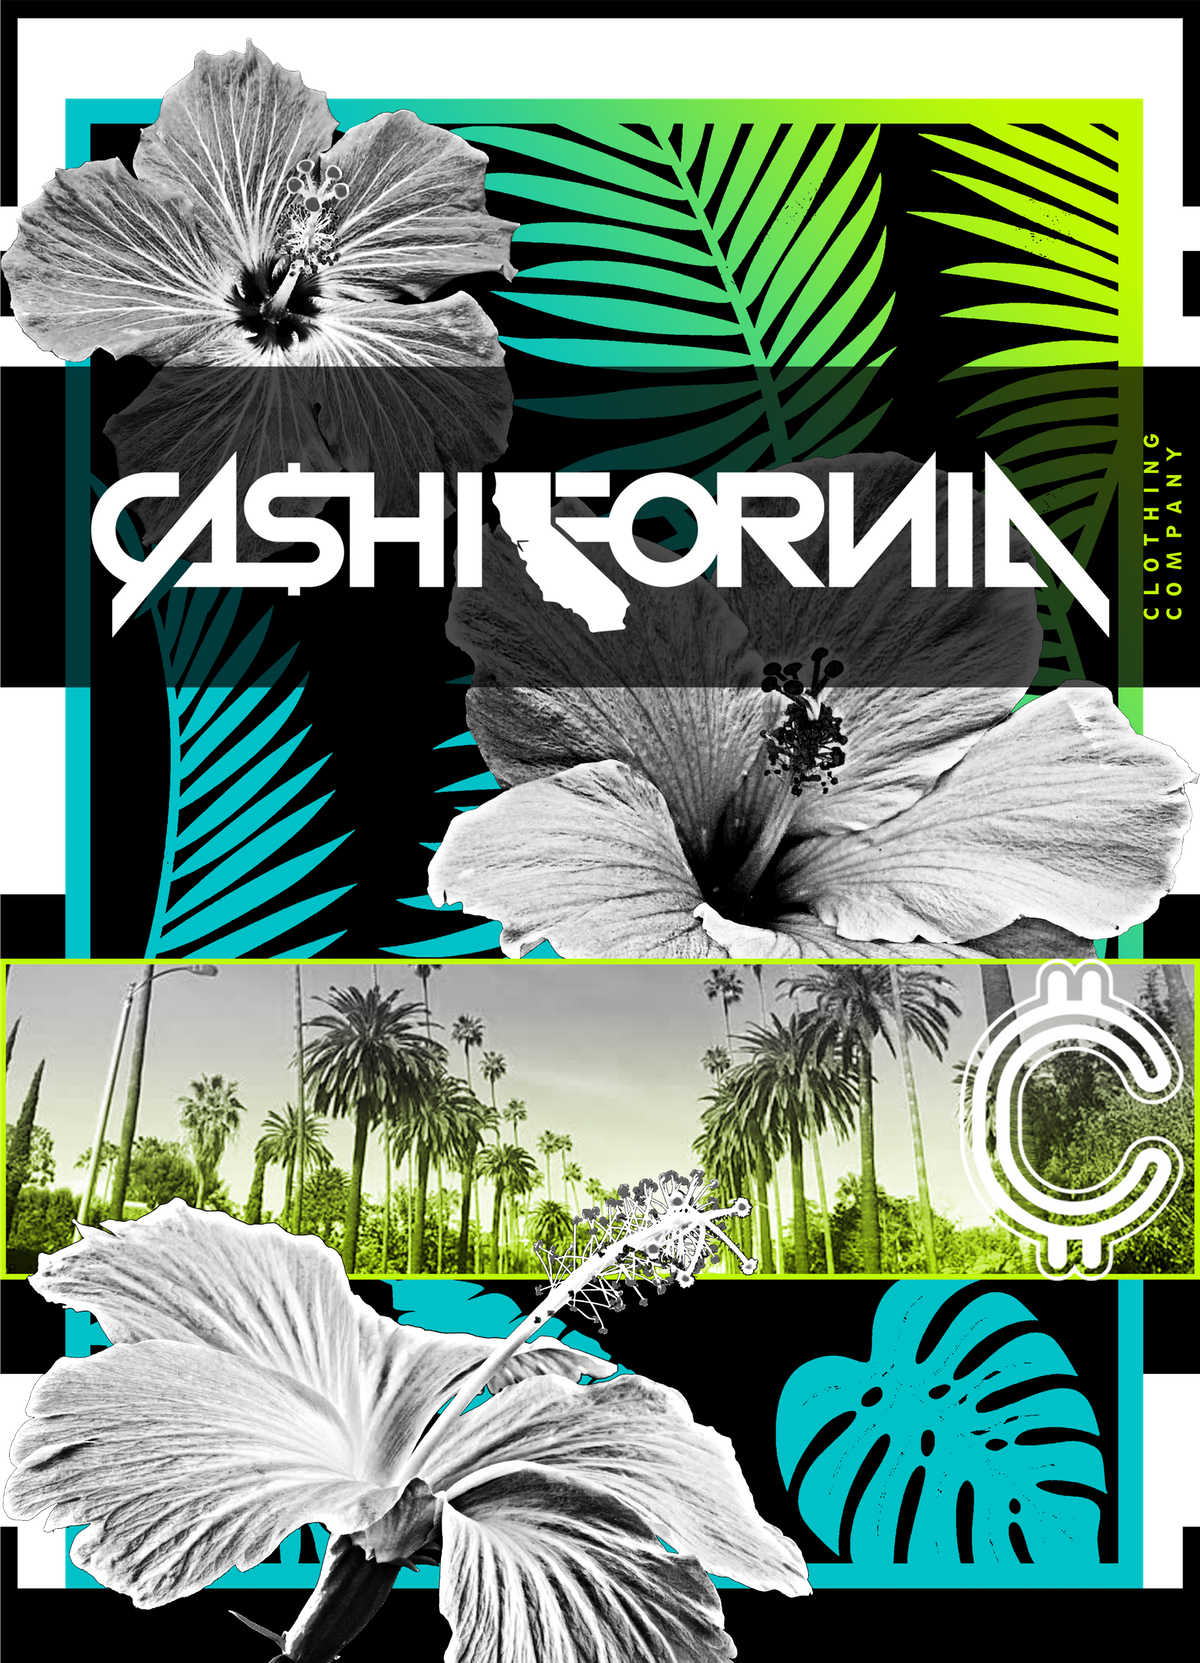 Cashifornia t-shirt design